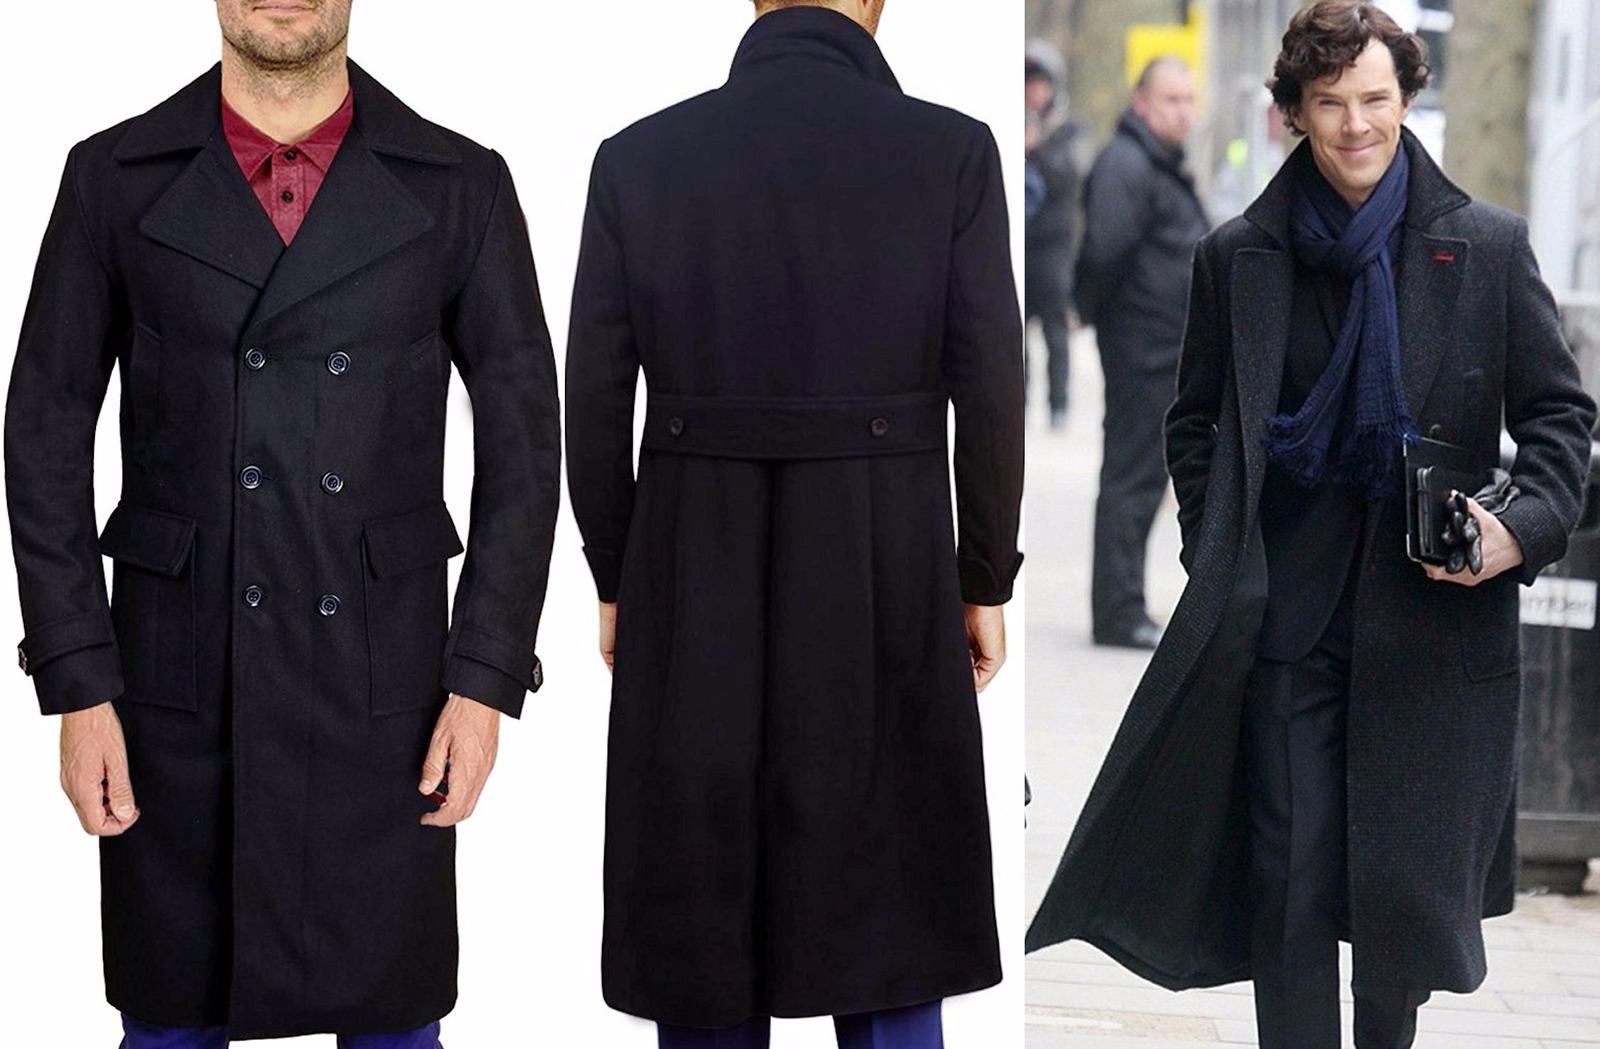 find workmanship no sale tax the best attitude Sherlock Holmes Benedict Cumberbatch Trench Coat Jacket - Best Price - All  Sizes